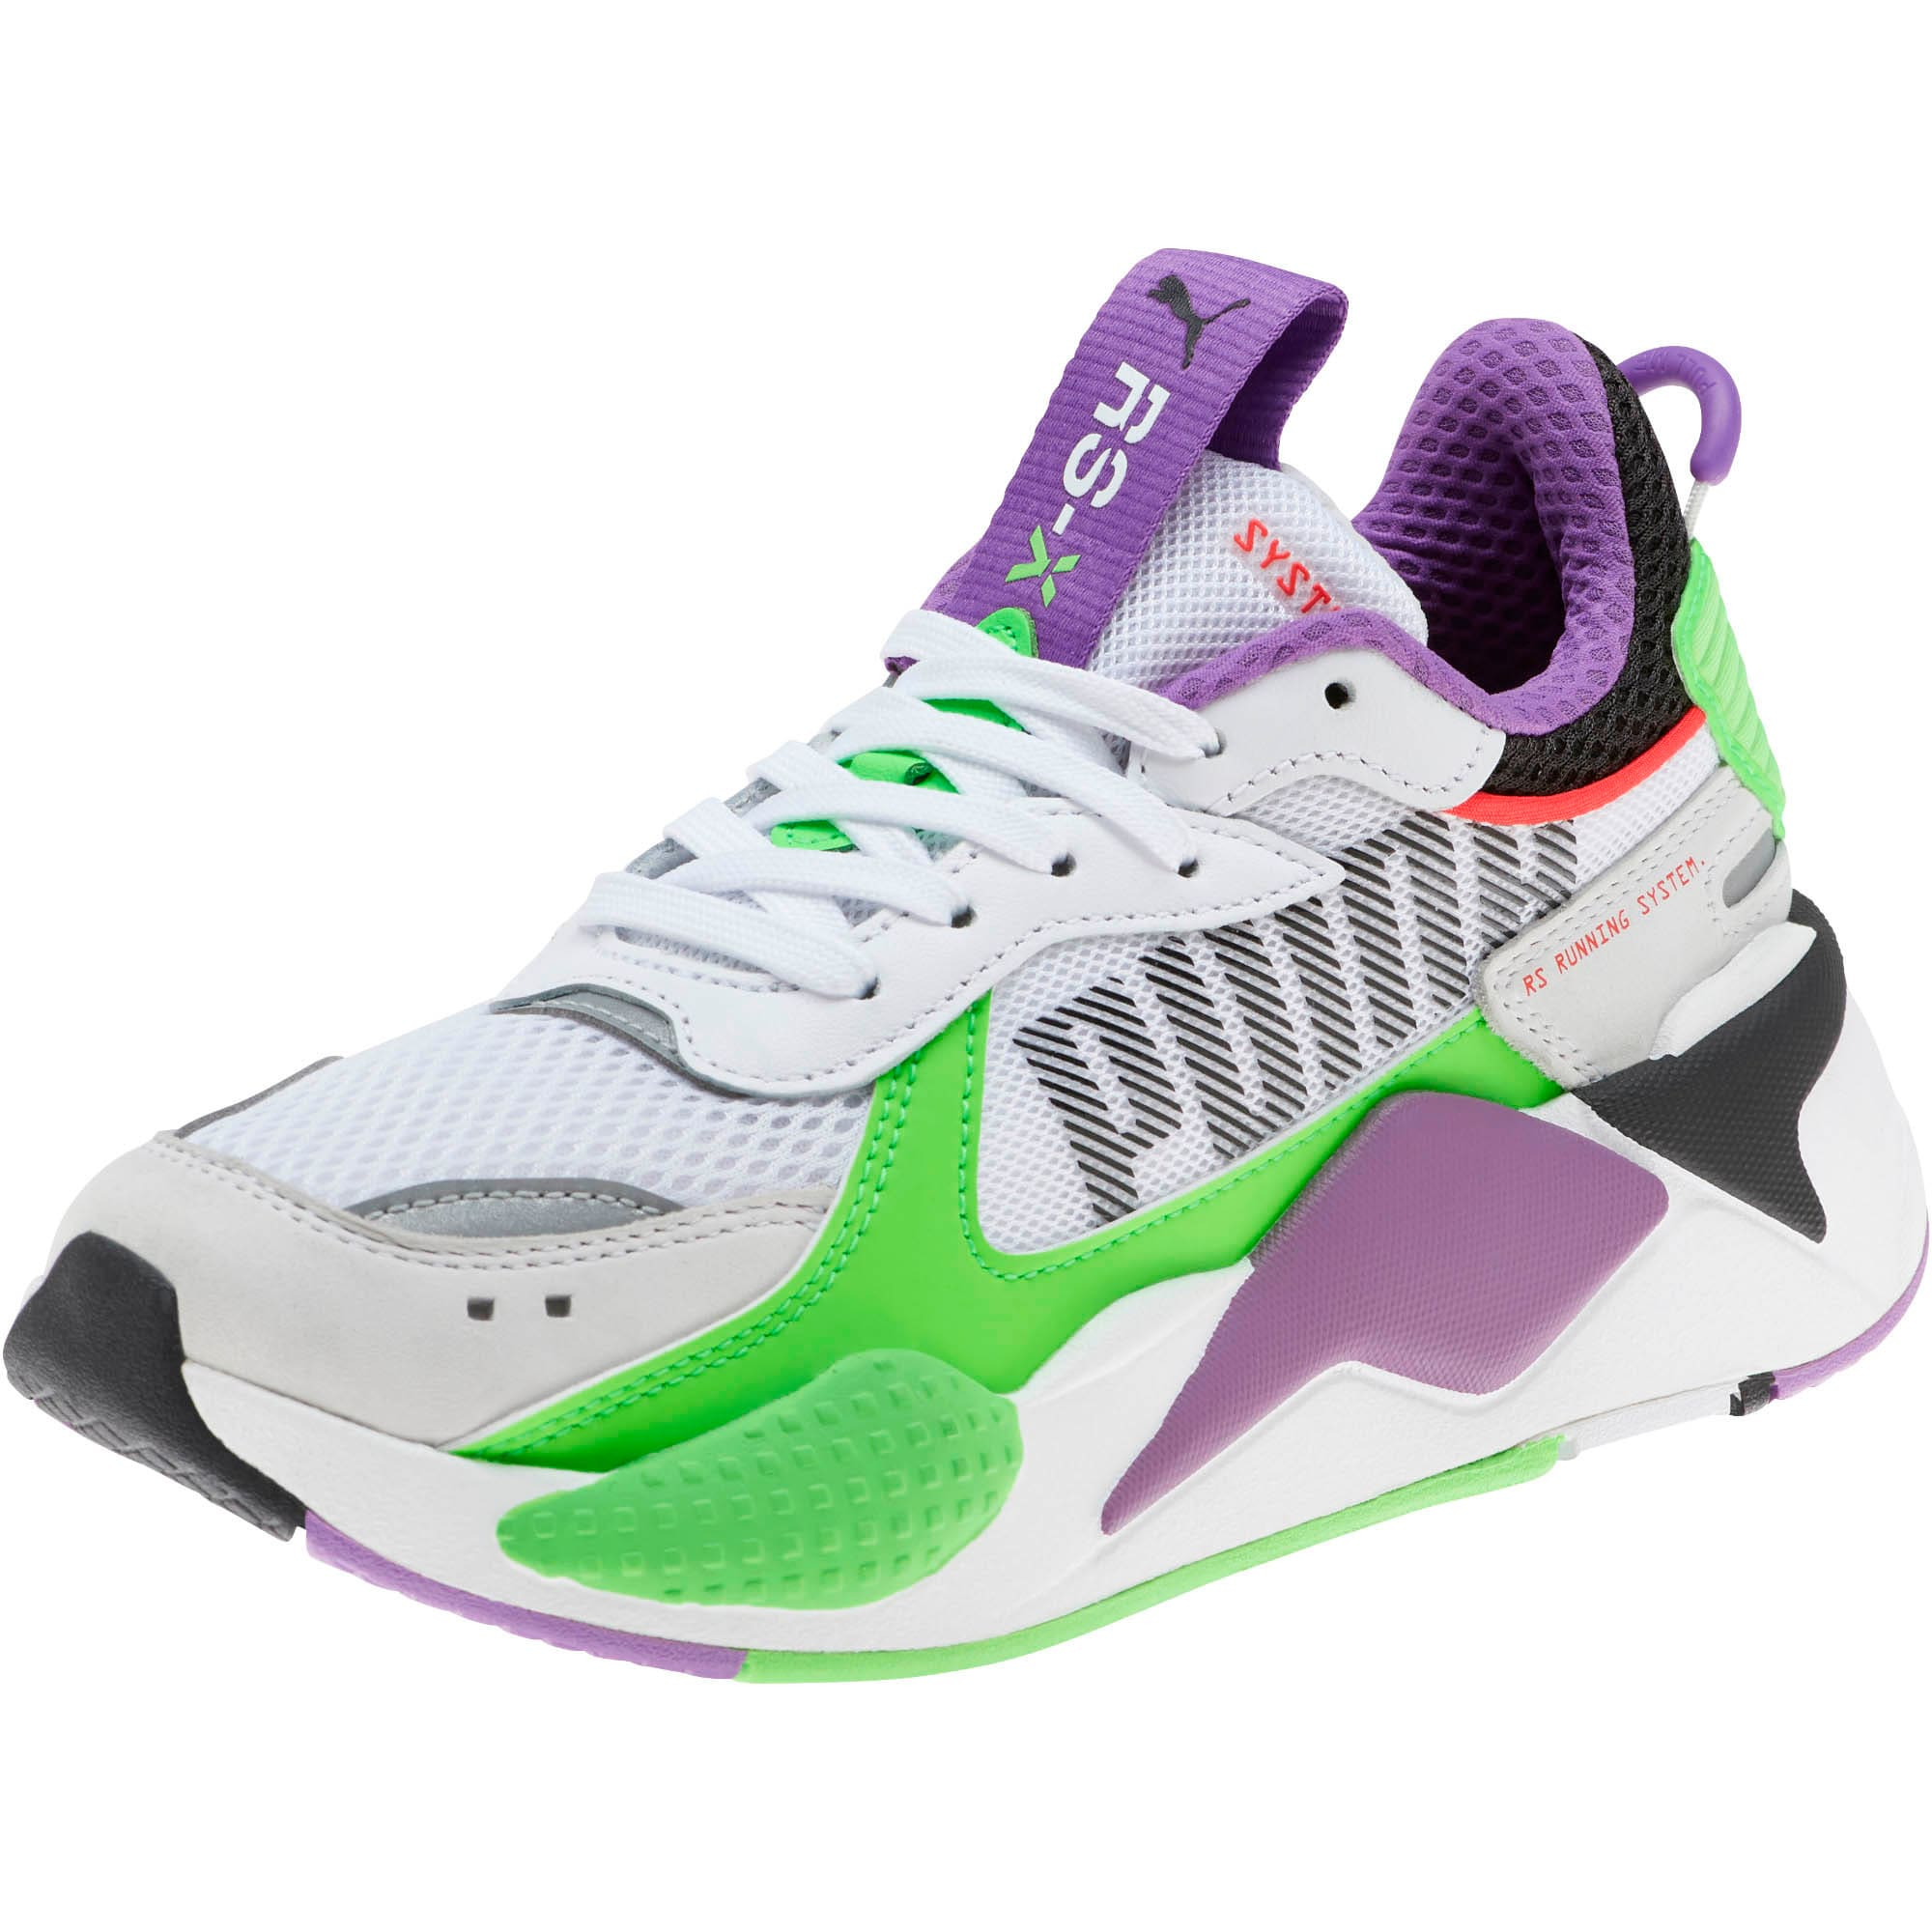 Thumbnail 1 of RS-X Bold Fluorescent Sneakers JR, PWhite-Gr Gecko-Royal Lilac, medium